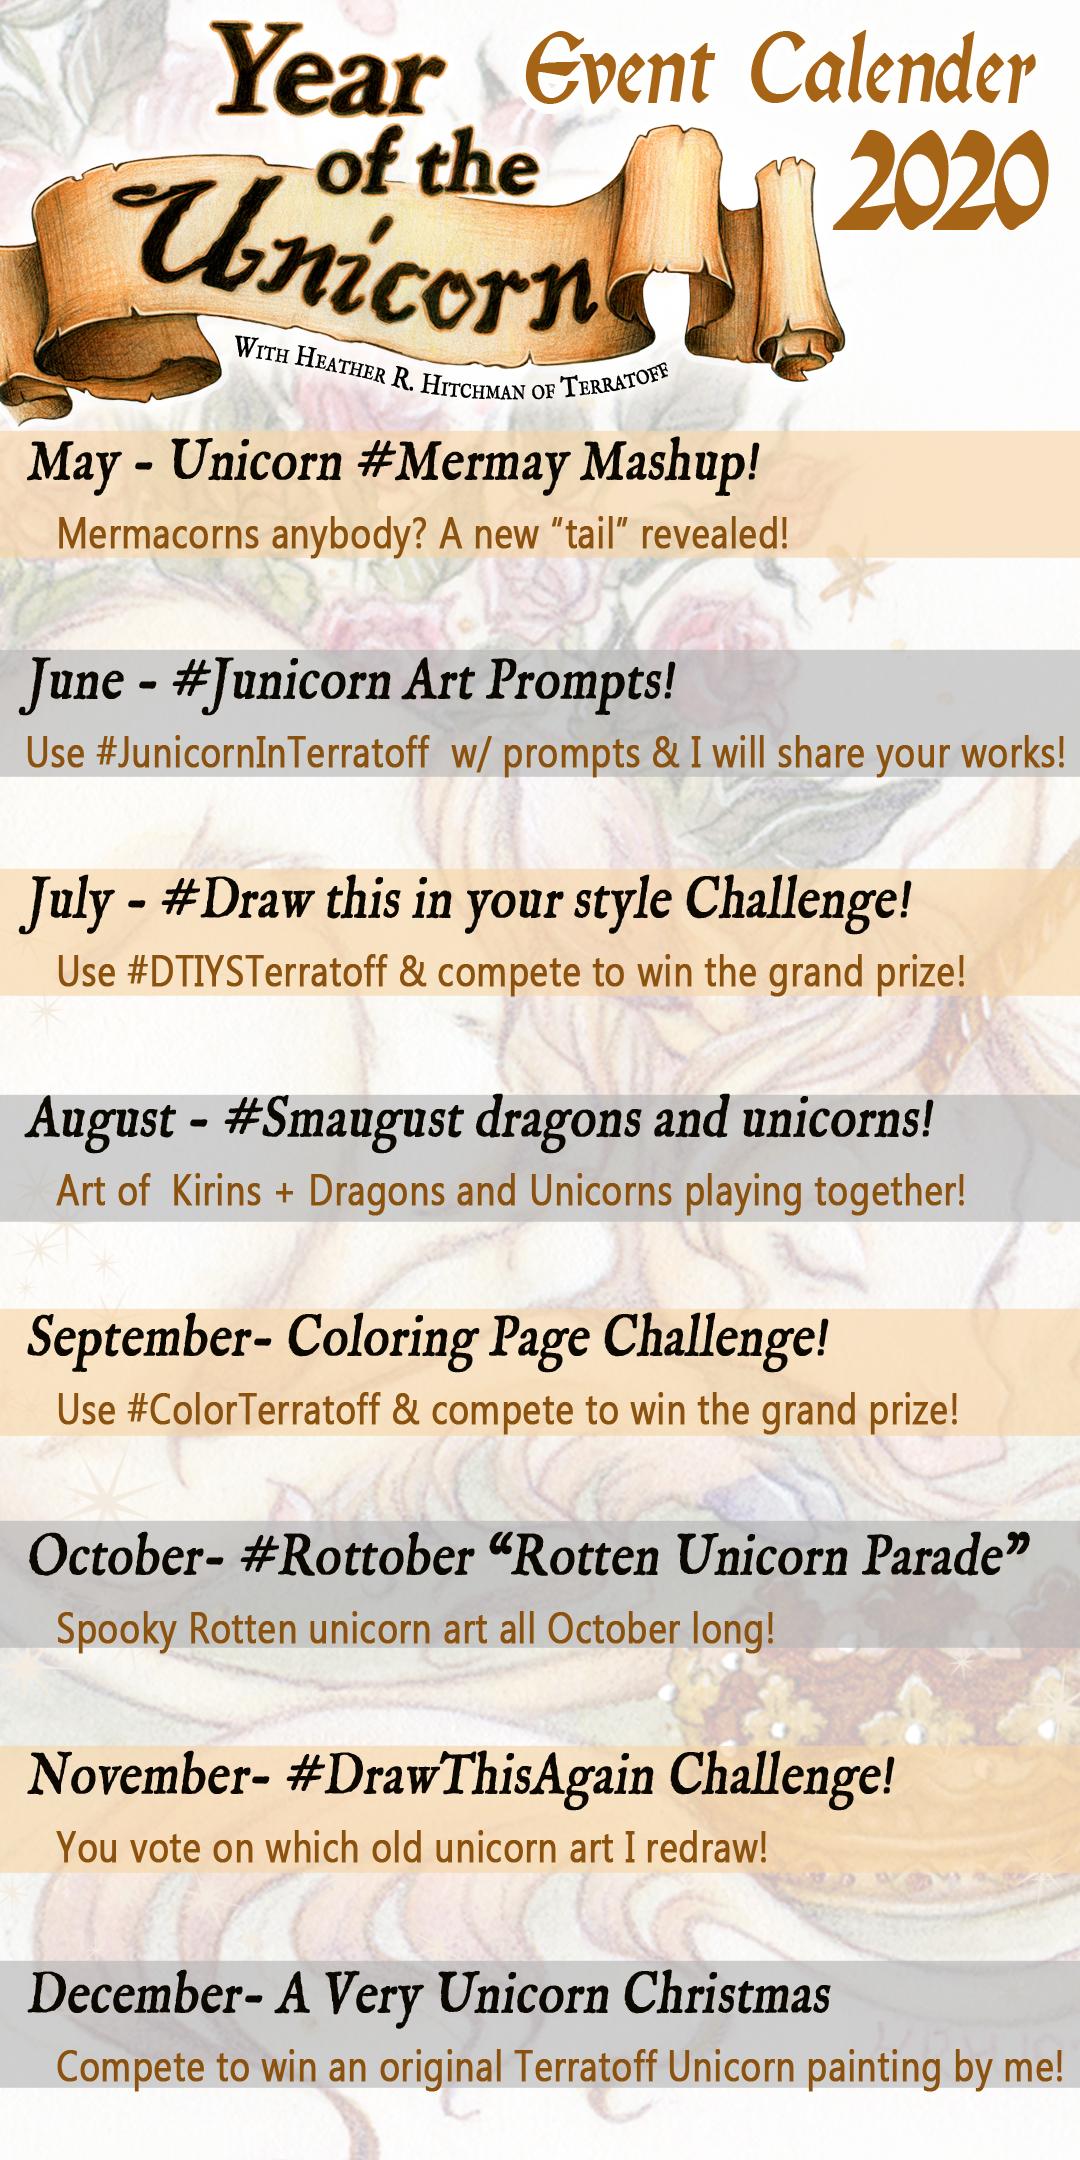 Year of the Unicorn Event Calendar 2020 with Heath